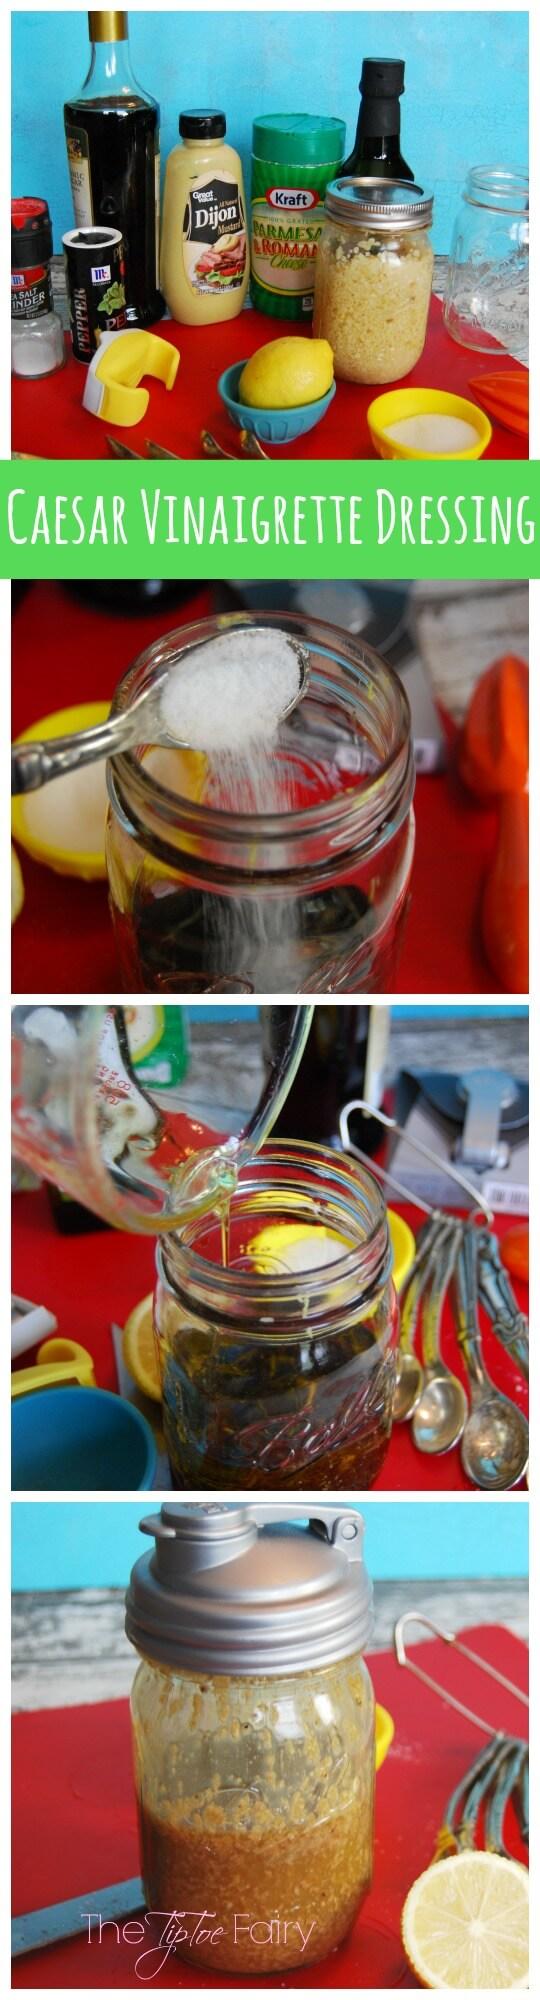 Combine ingredients and shake it up to make Caesar Vinaigrette Dressing